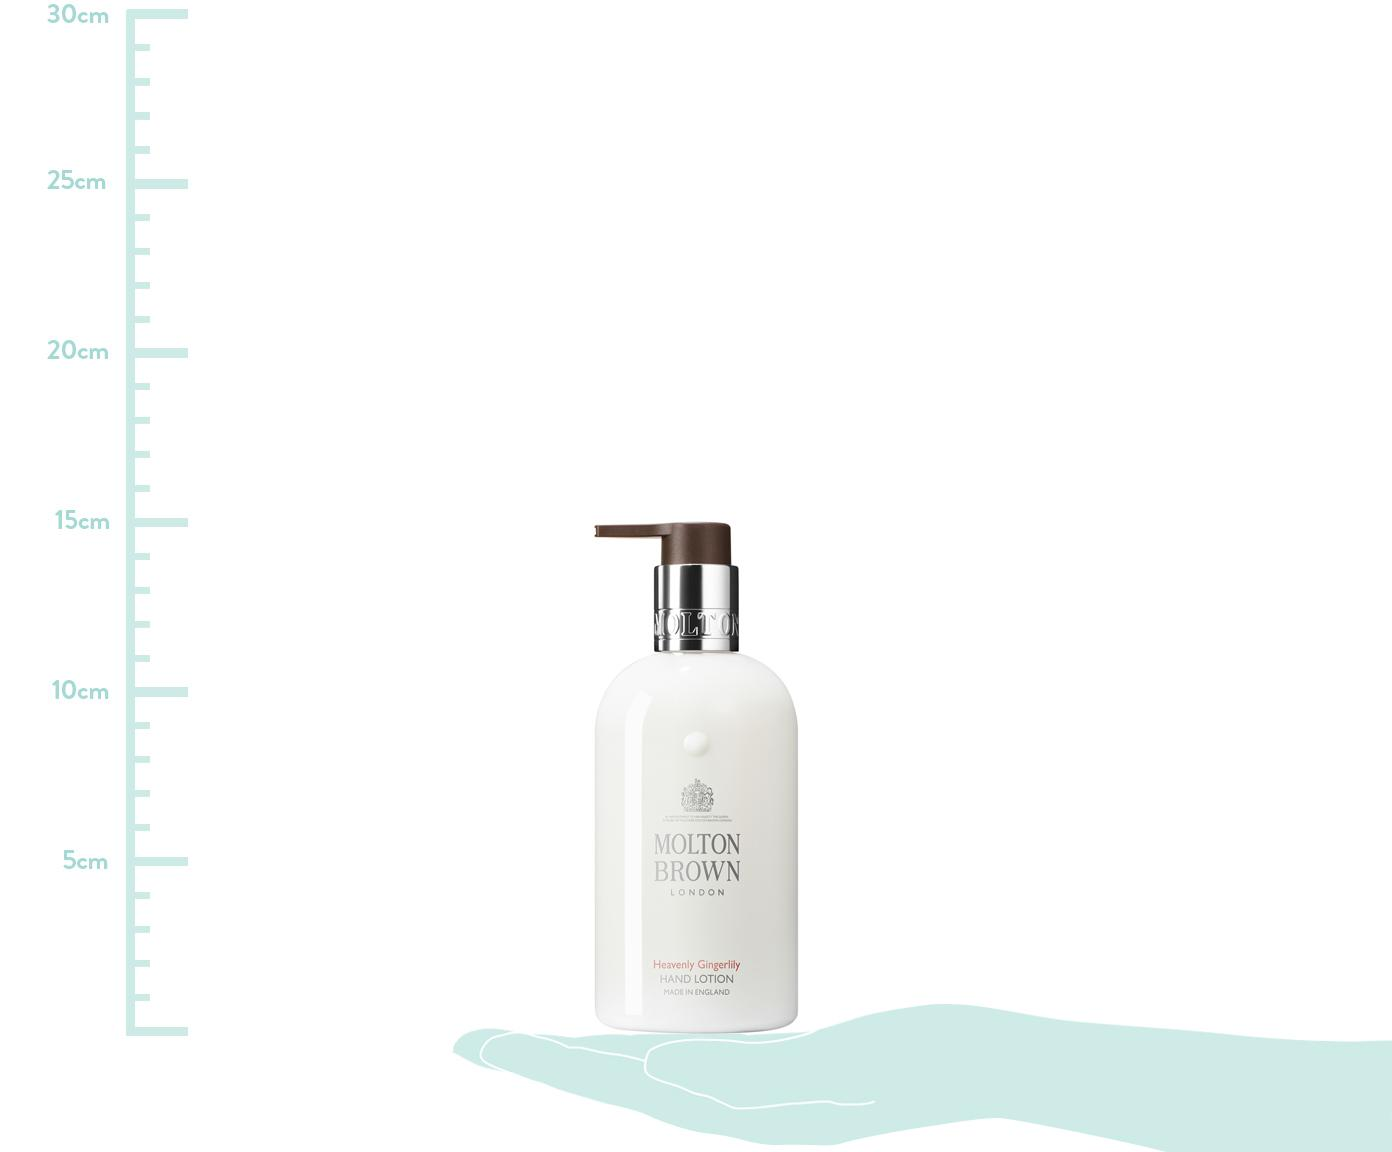 Handcreme Molton (Ingwer), Behälter: Recycelbarer Kunststoff, Weiß, Ø 6 x H 15 cm